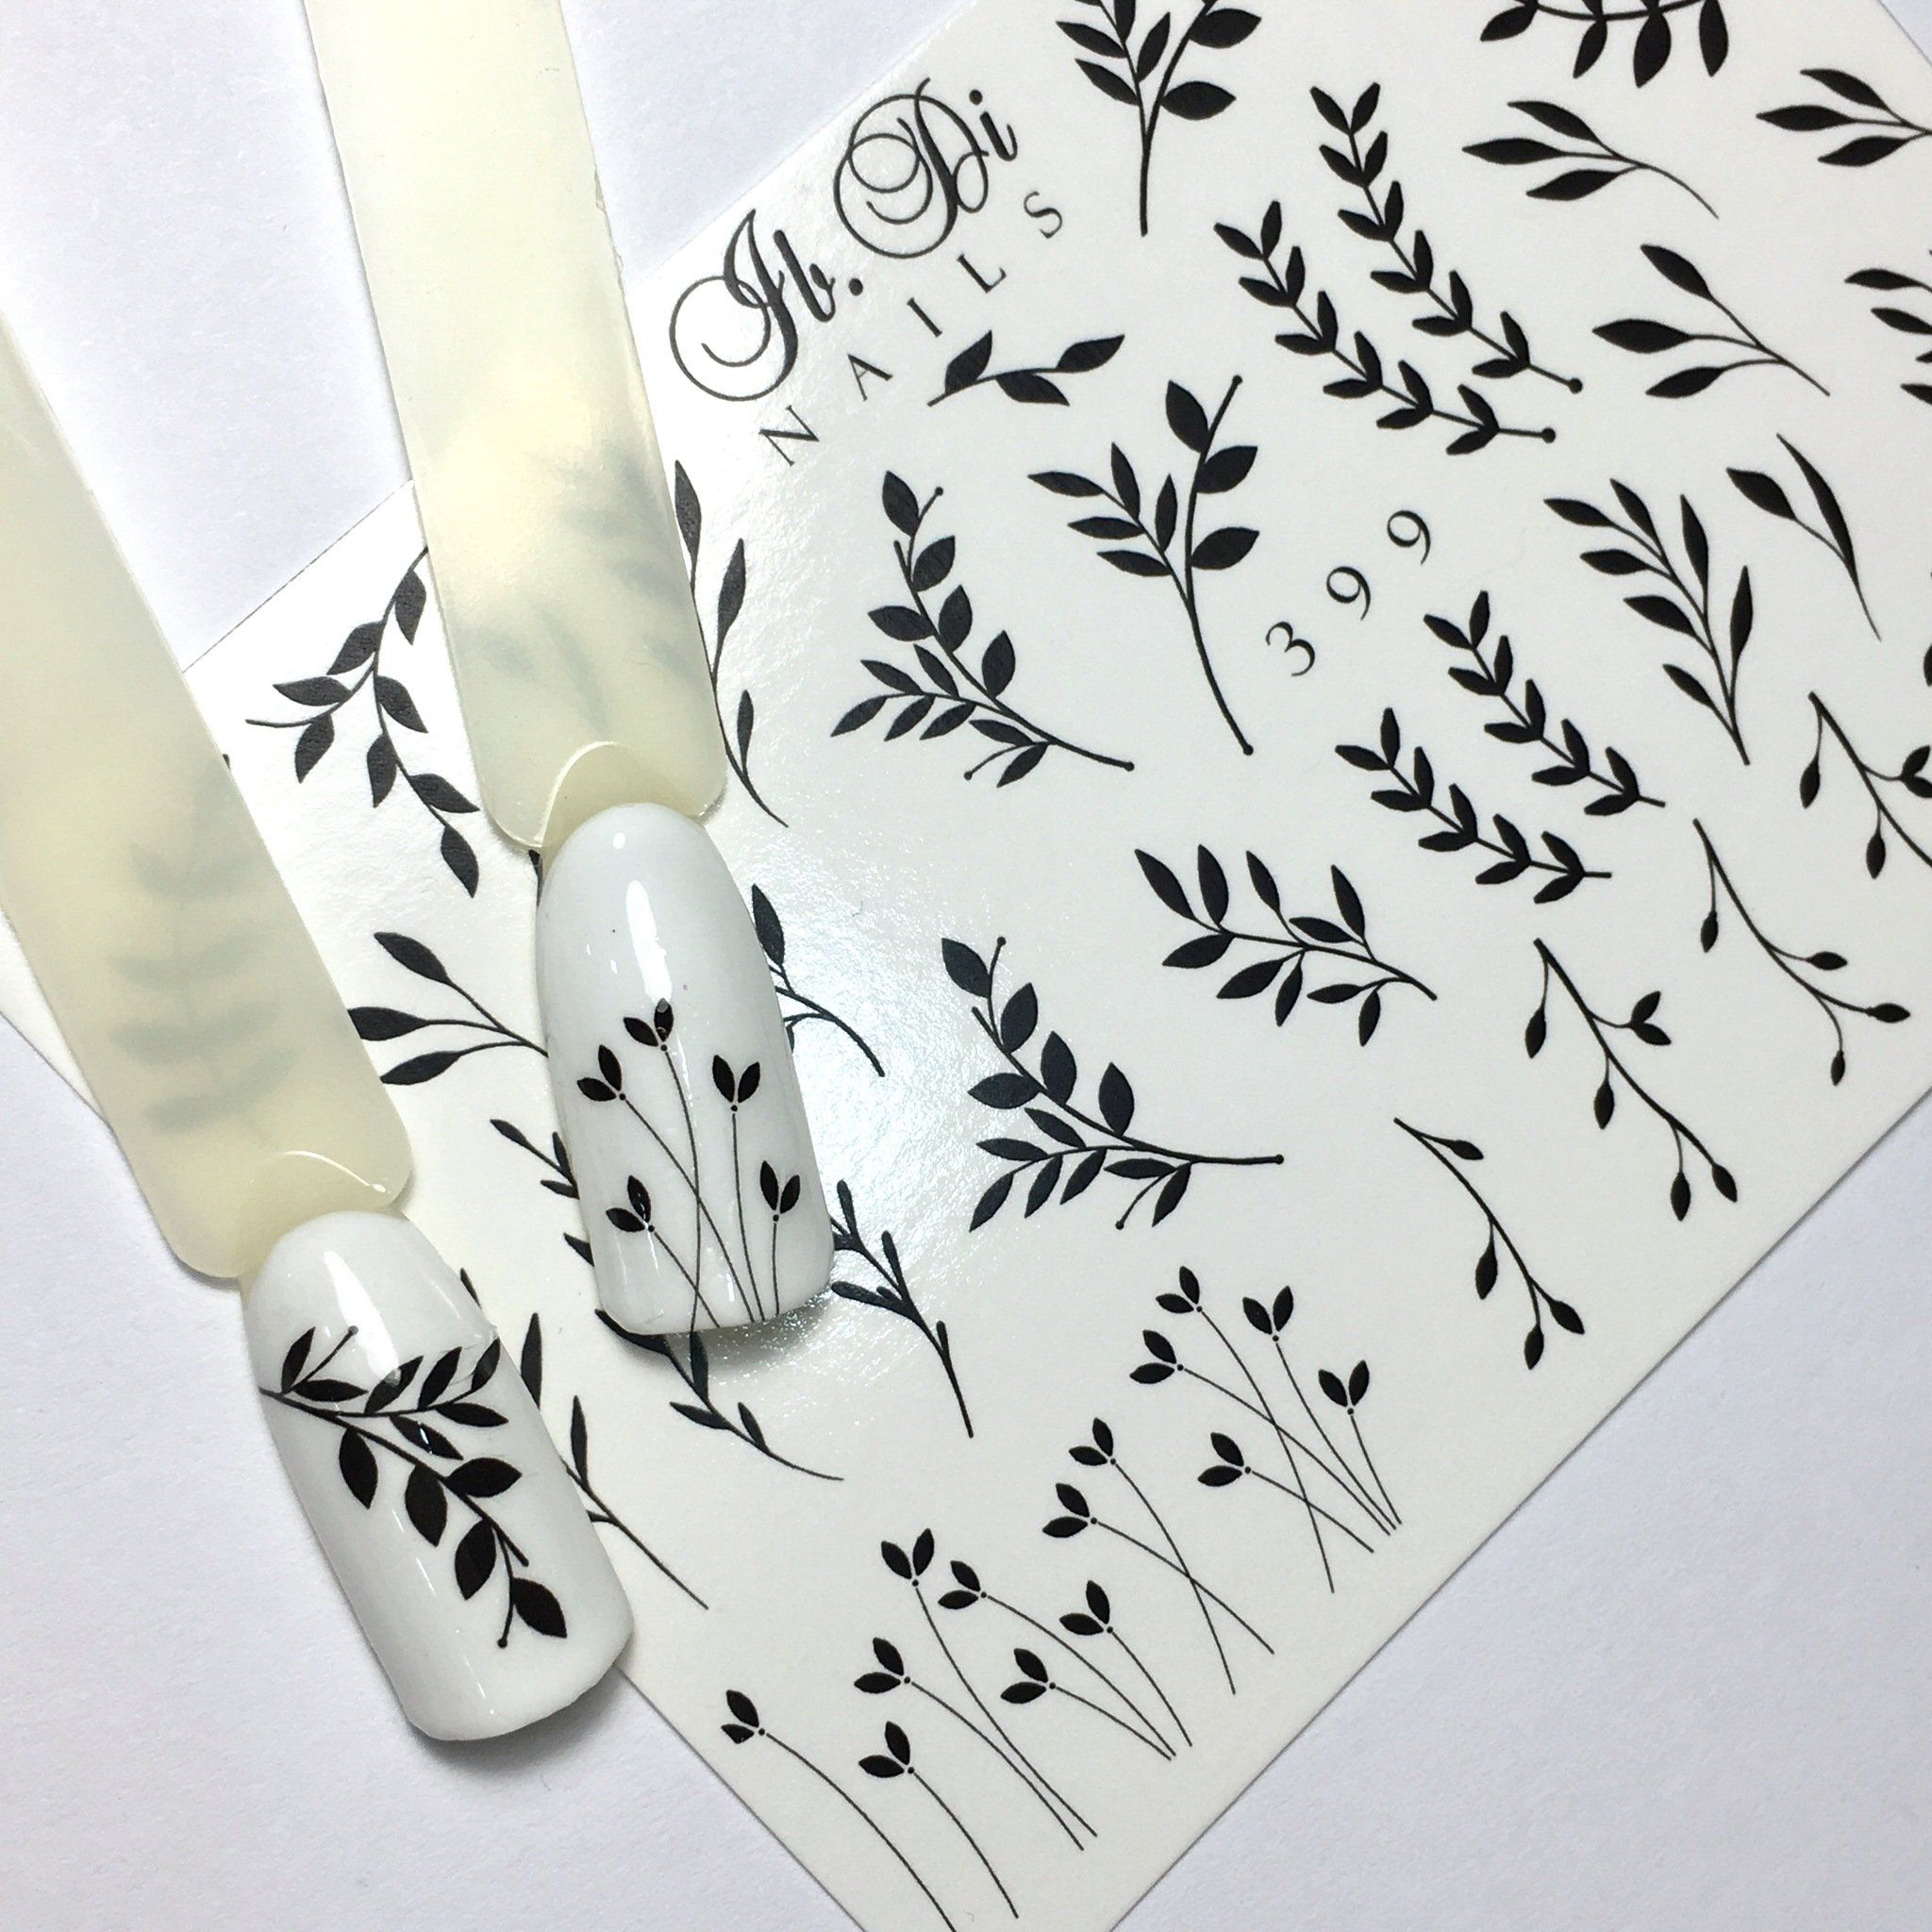 Ibdi B W Leaf Nail Decals Sliders In 2020 Nail Decals Designs Nail Decals Manicure